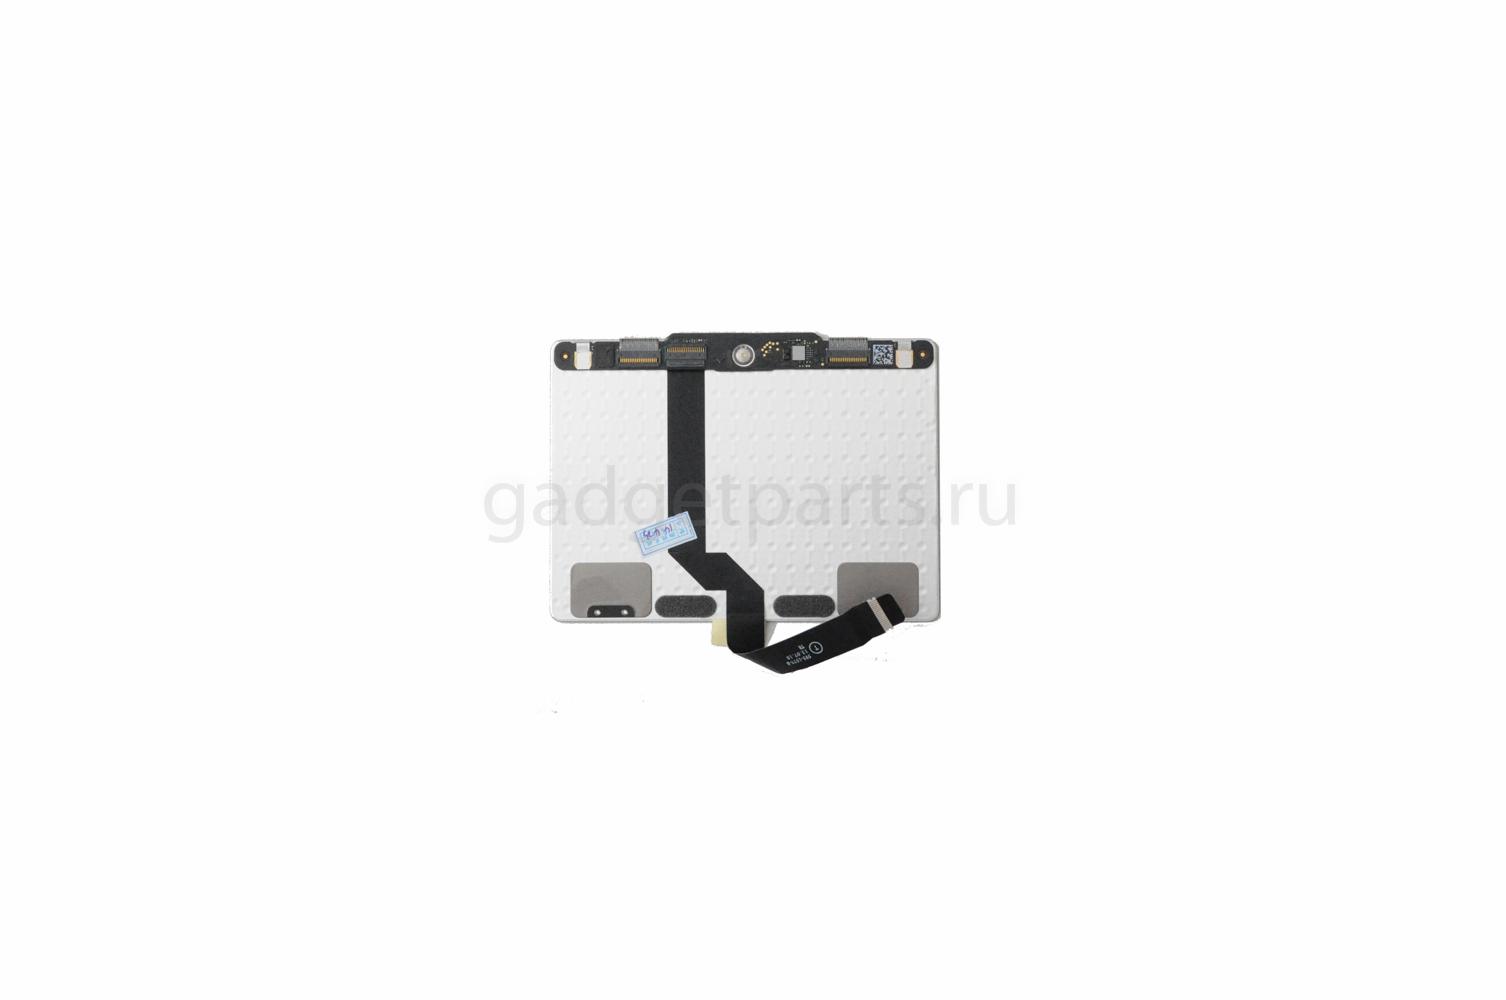 Тачпад MacBook Pro Retina 13 A1425 2012 год